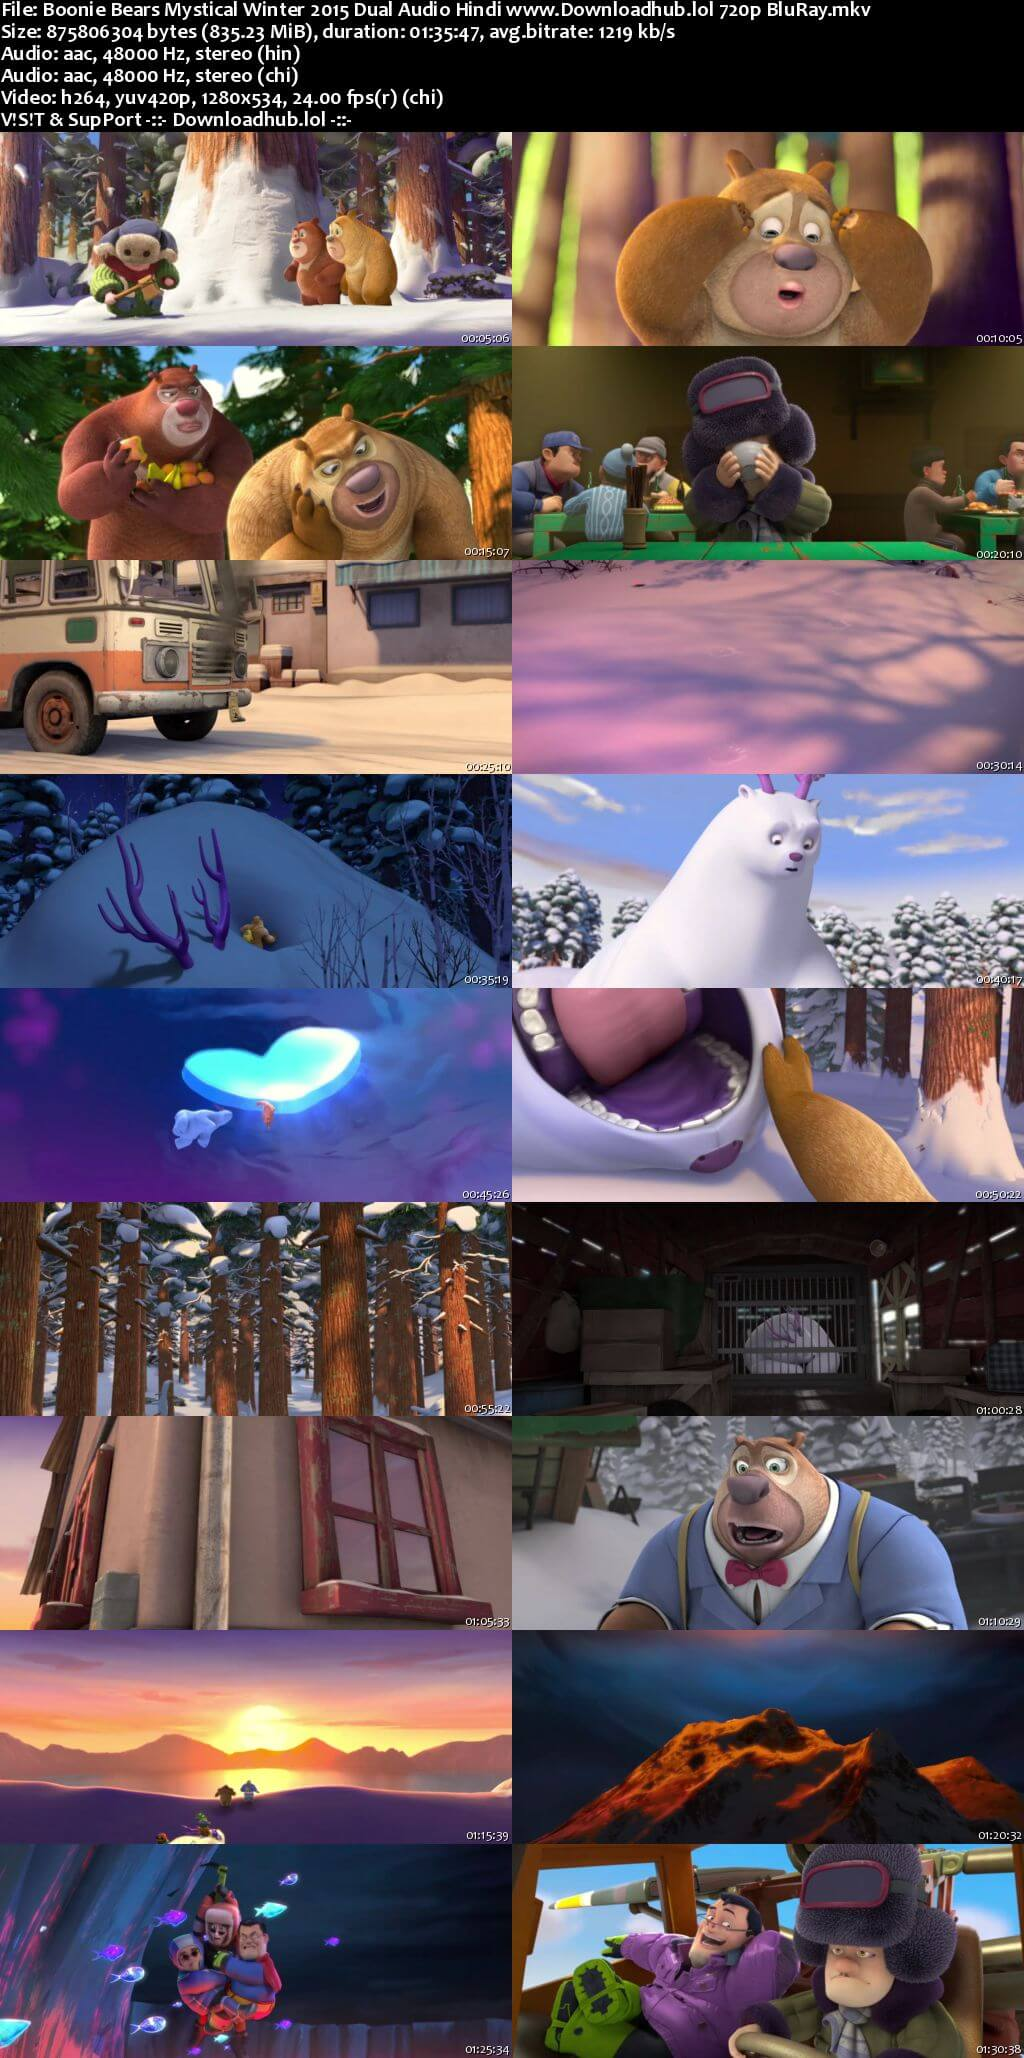 Boonie Bears Mystical Winter 2015 Hindi Dual Audio 720p BluRay x264